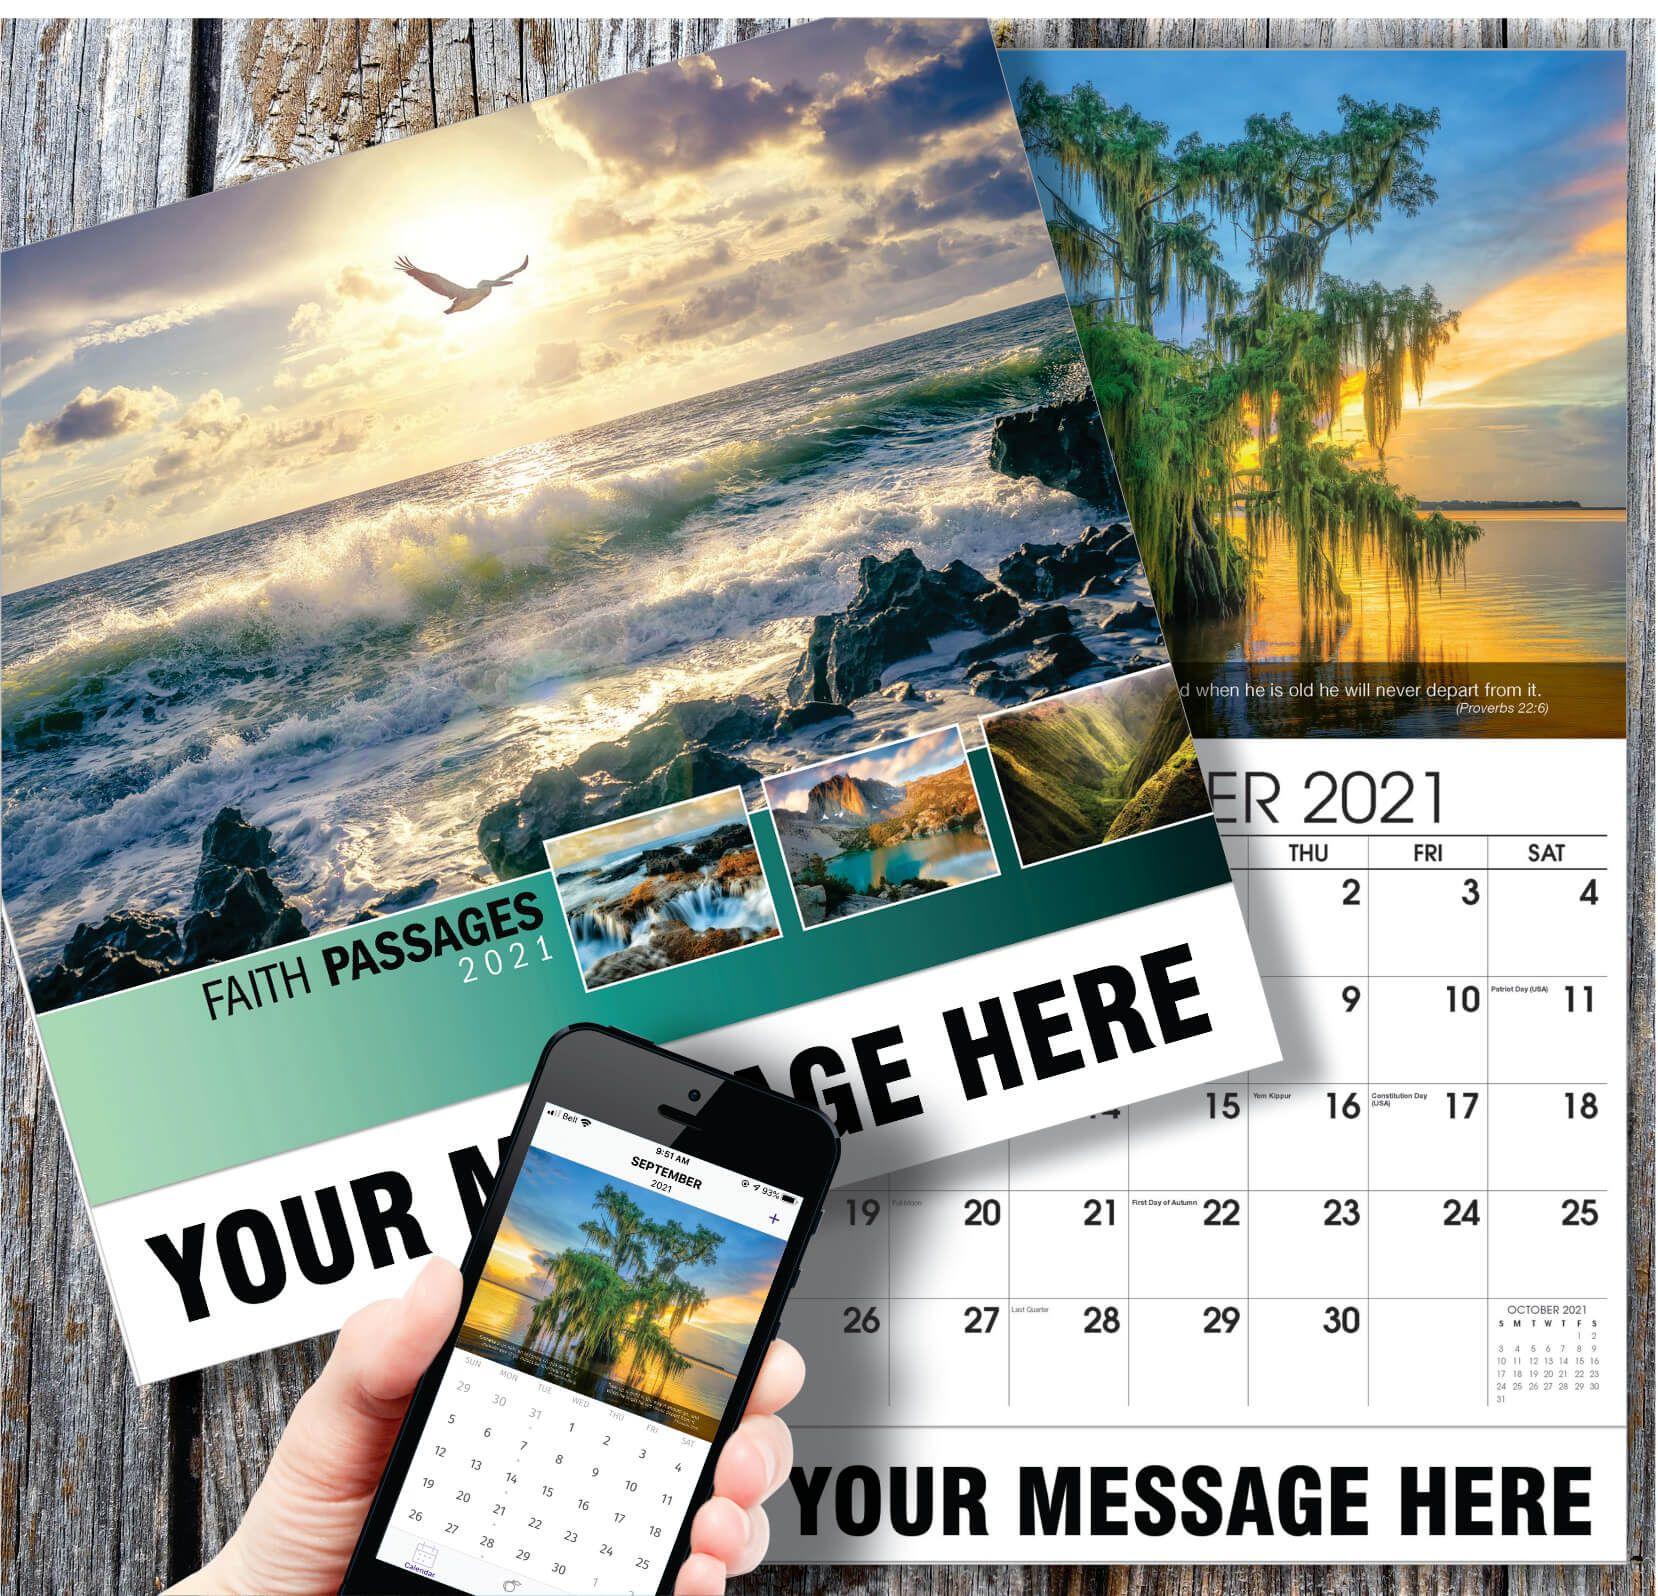 Faith Passages in 2020 School calendar, Promotional